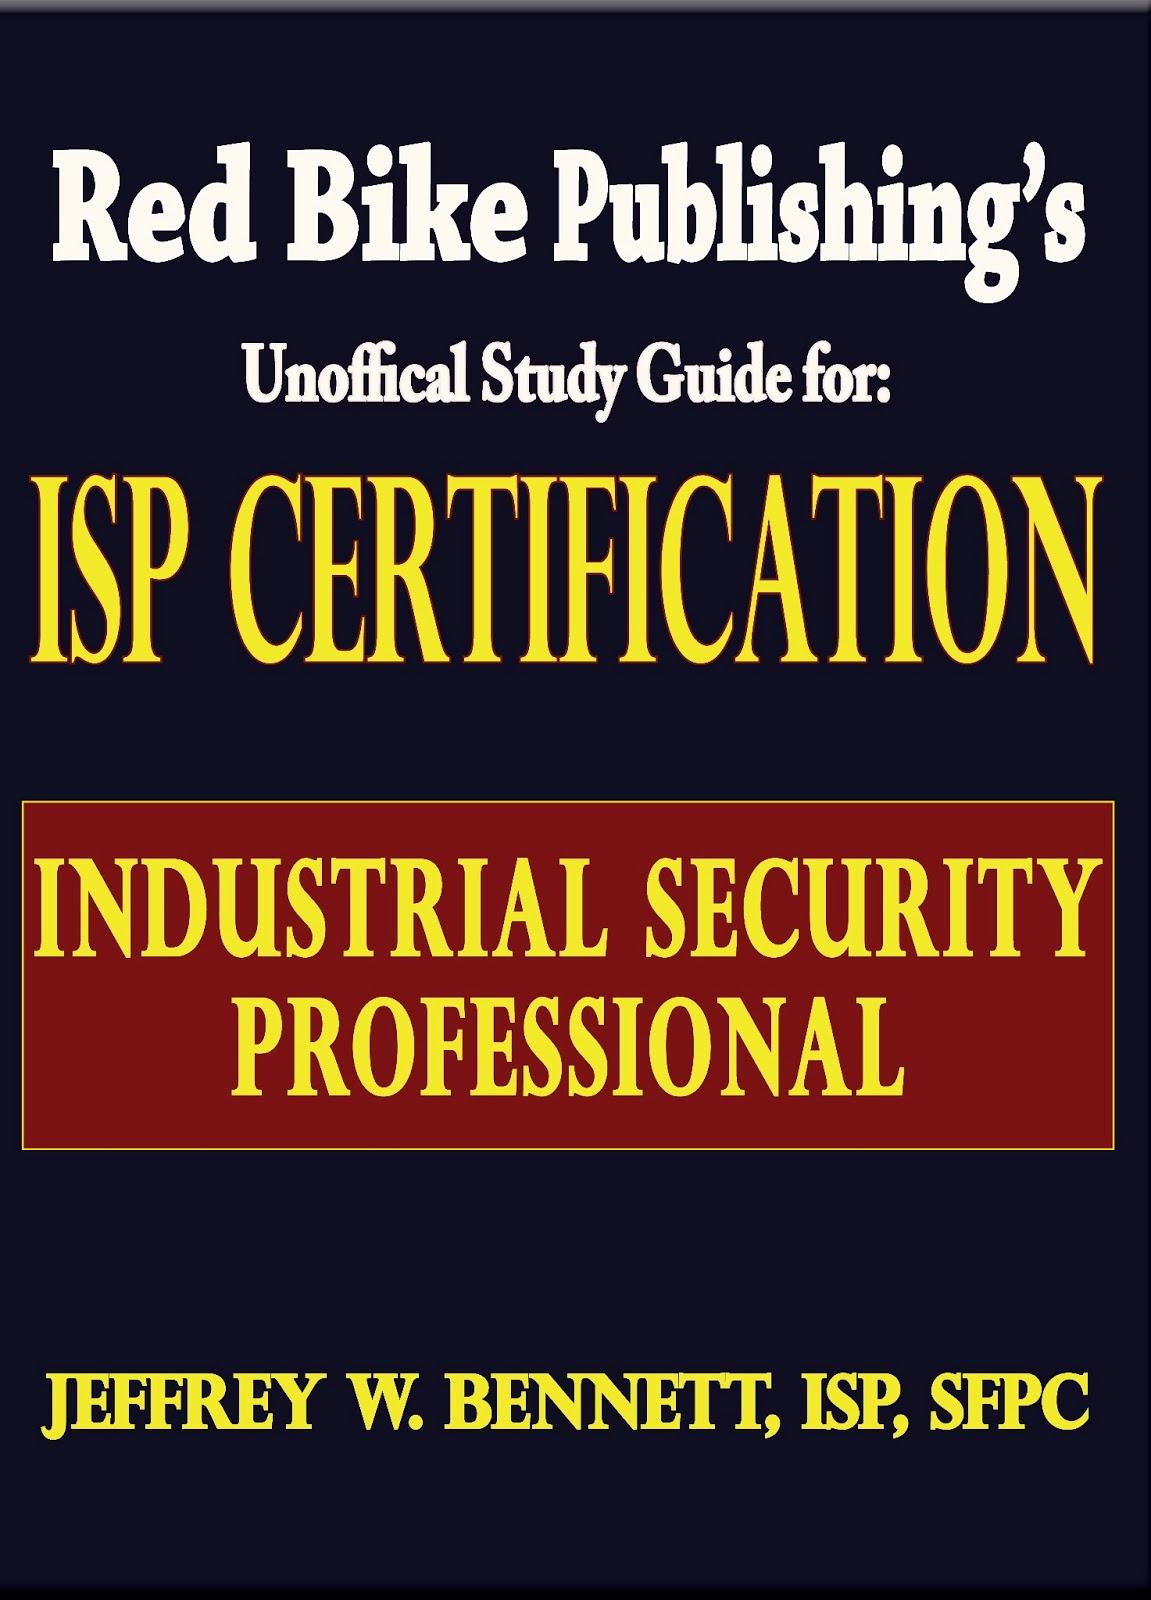 Red Bike Publishing Security And Intelligence Blog